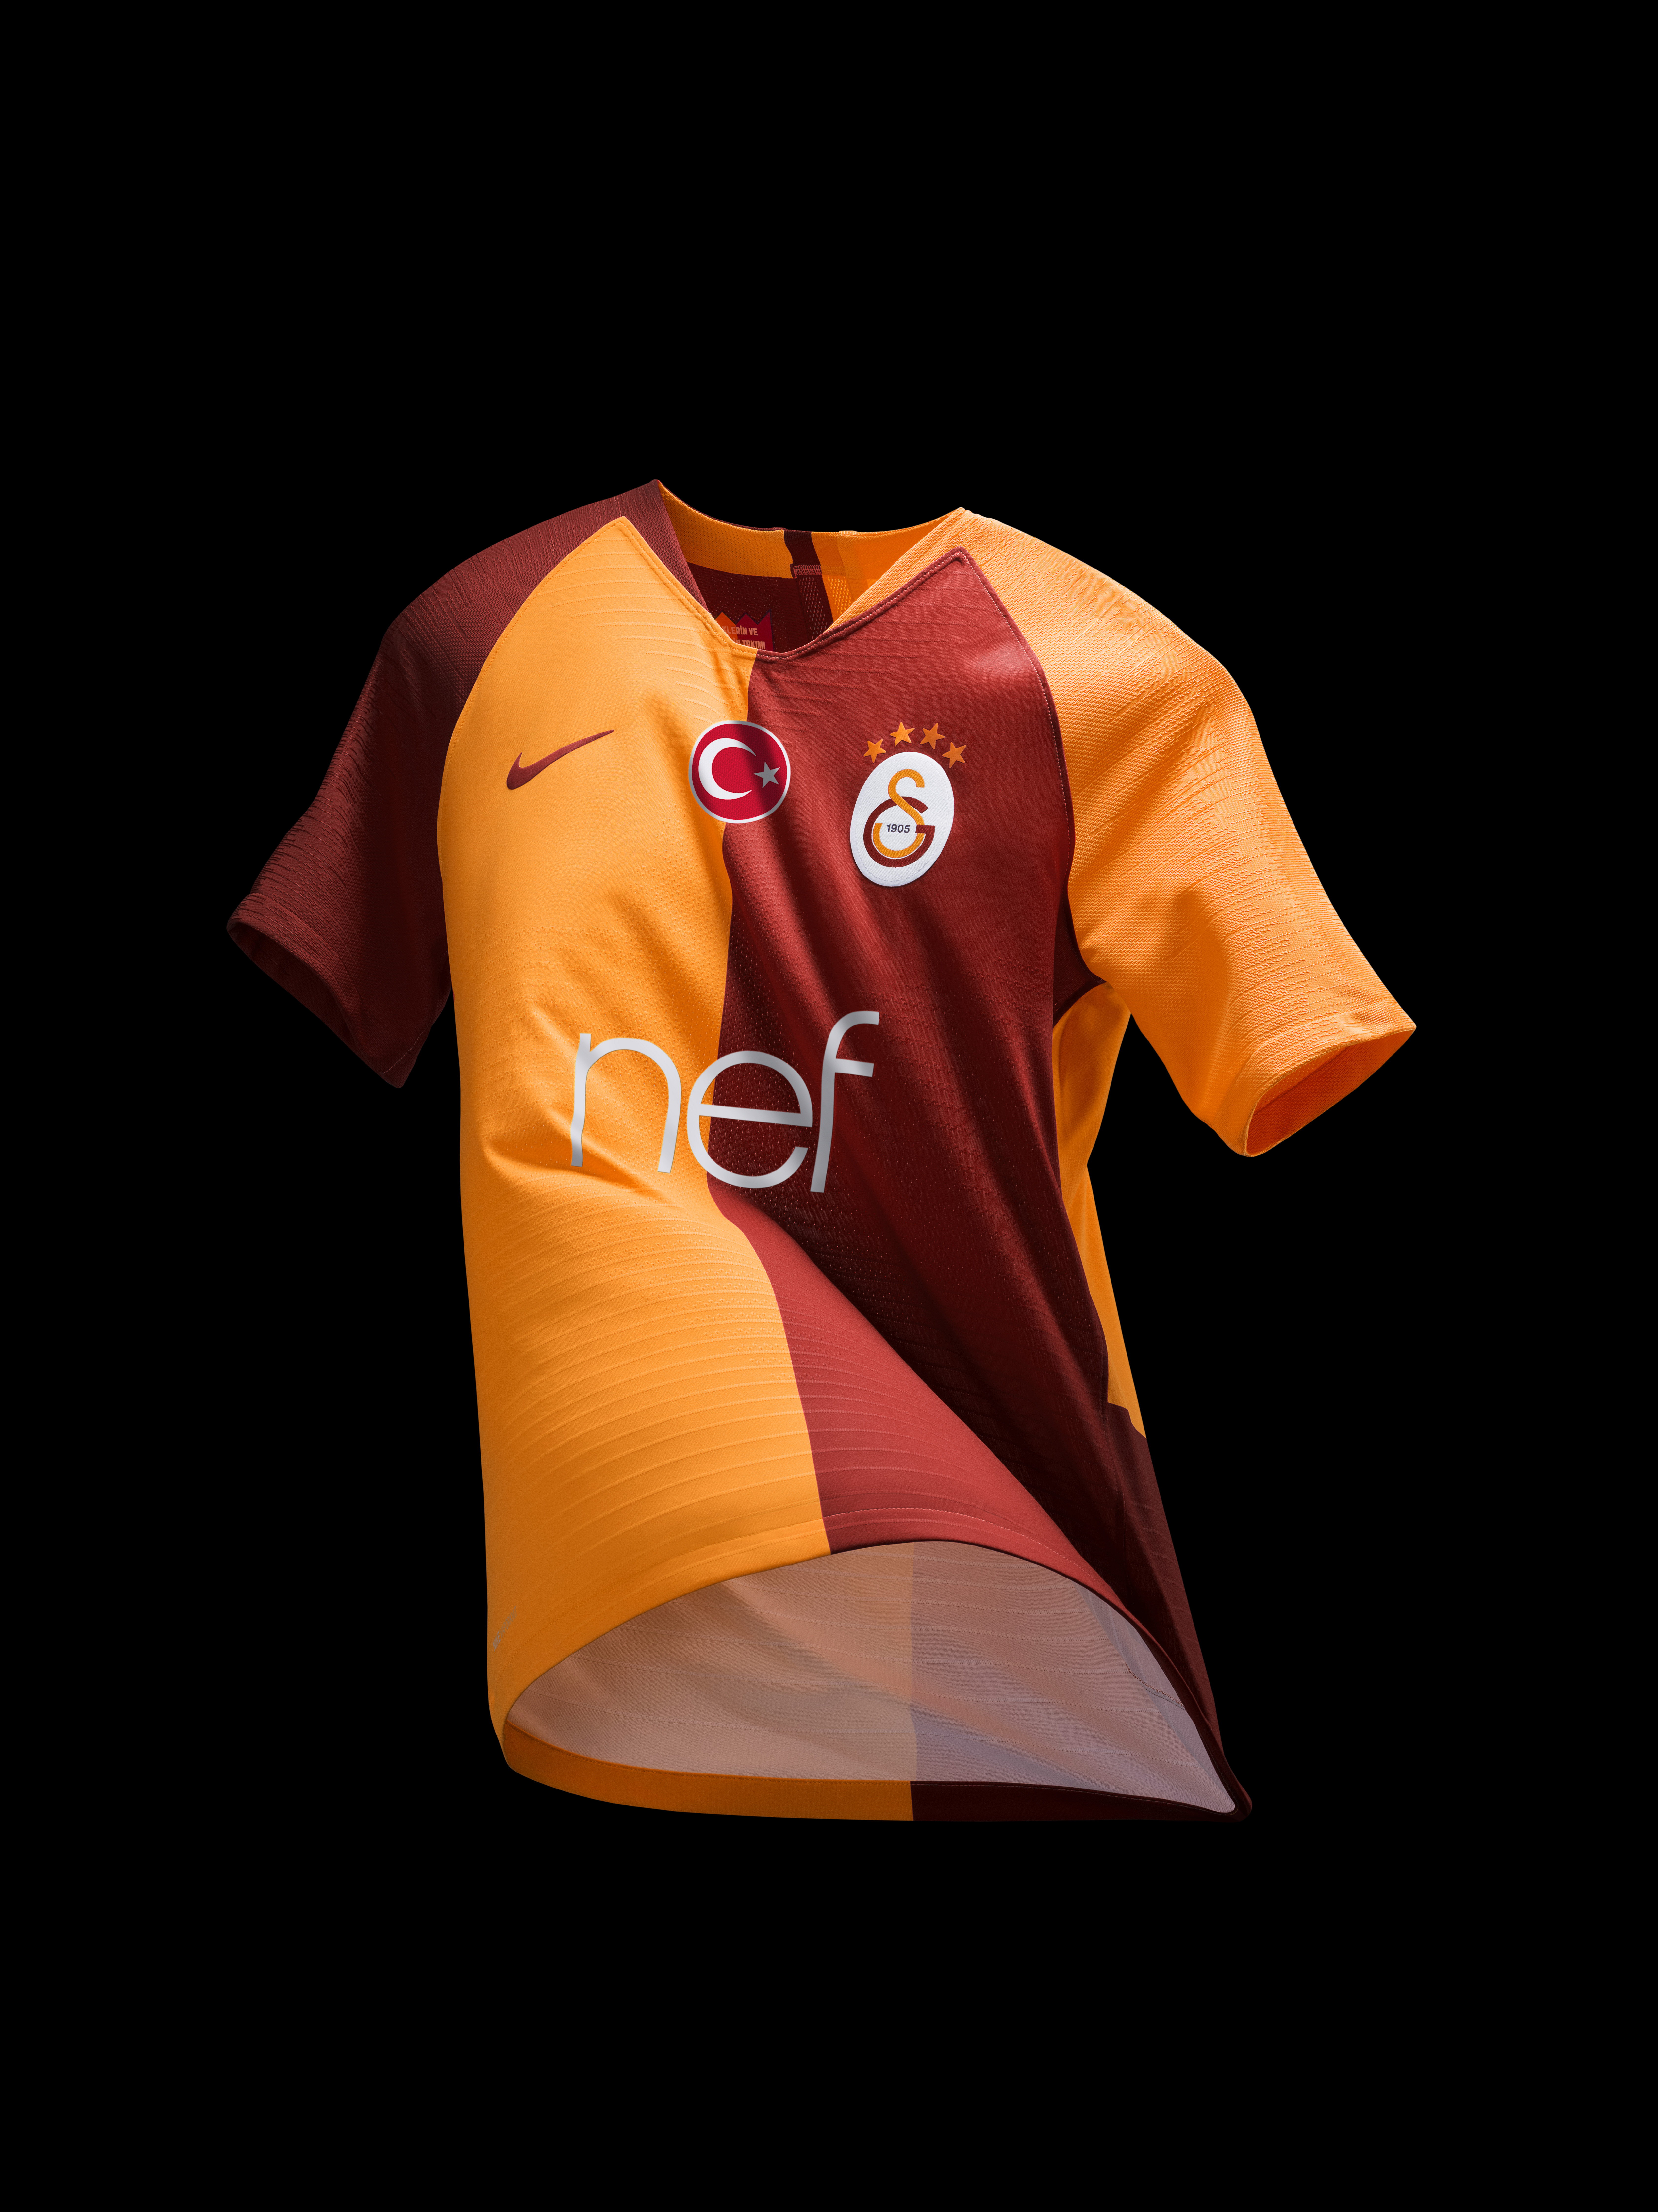 2018 19 kits every new official home and away jerseys for barcelona man utd liverpool more goal com goal com